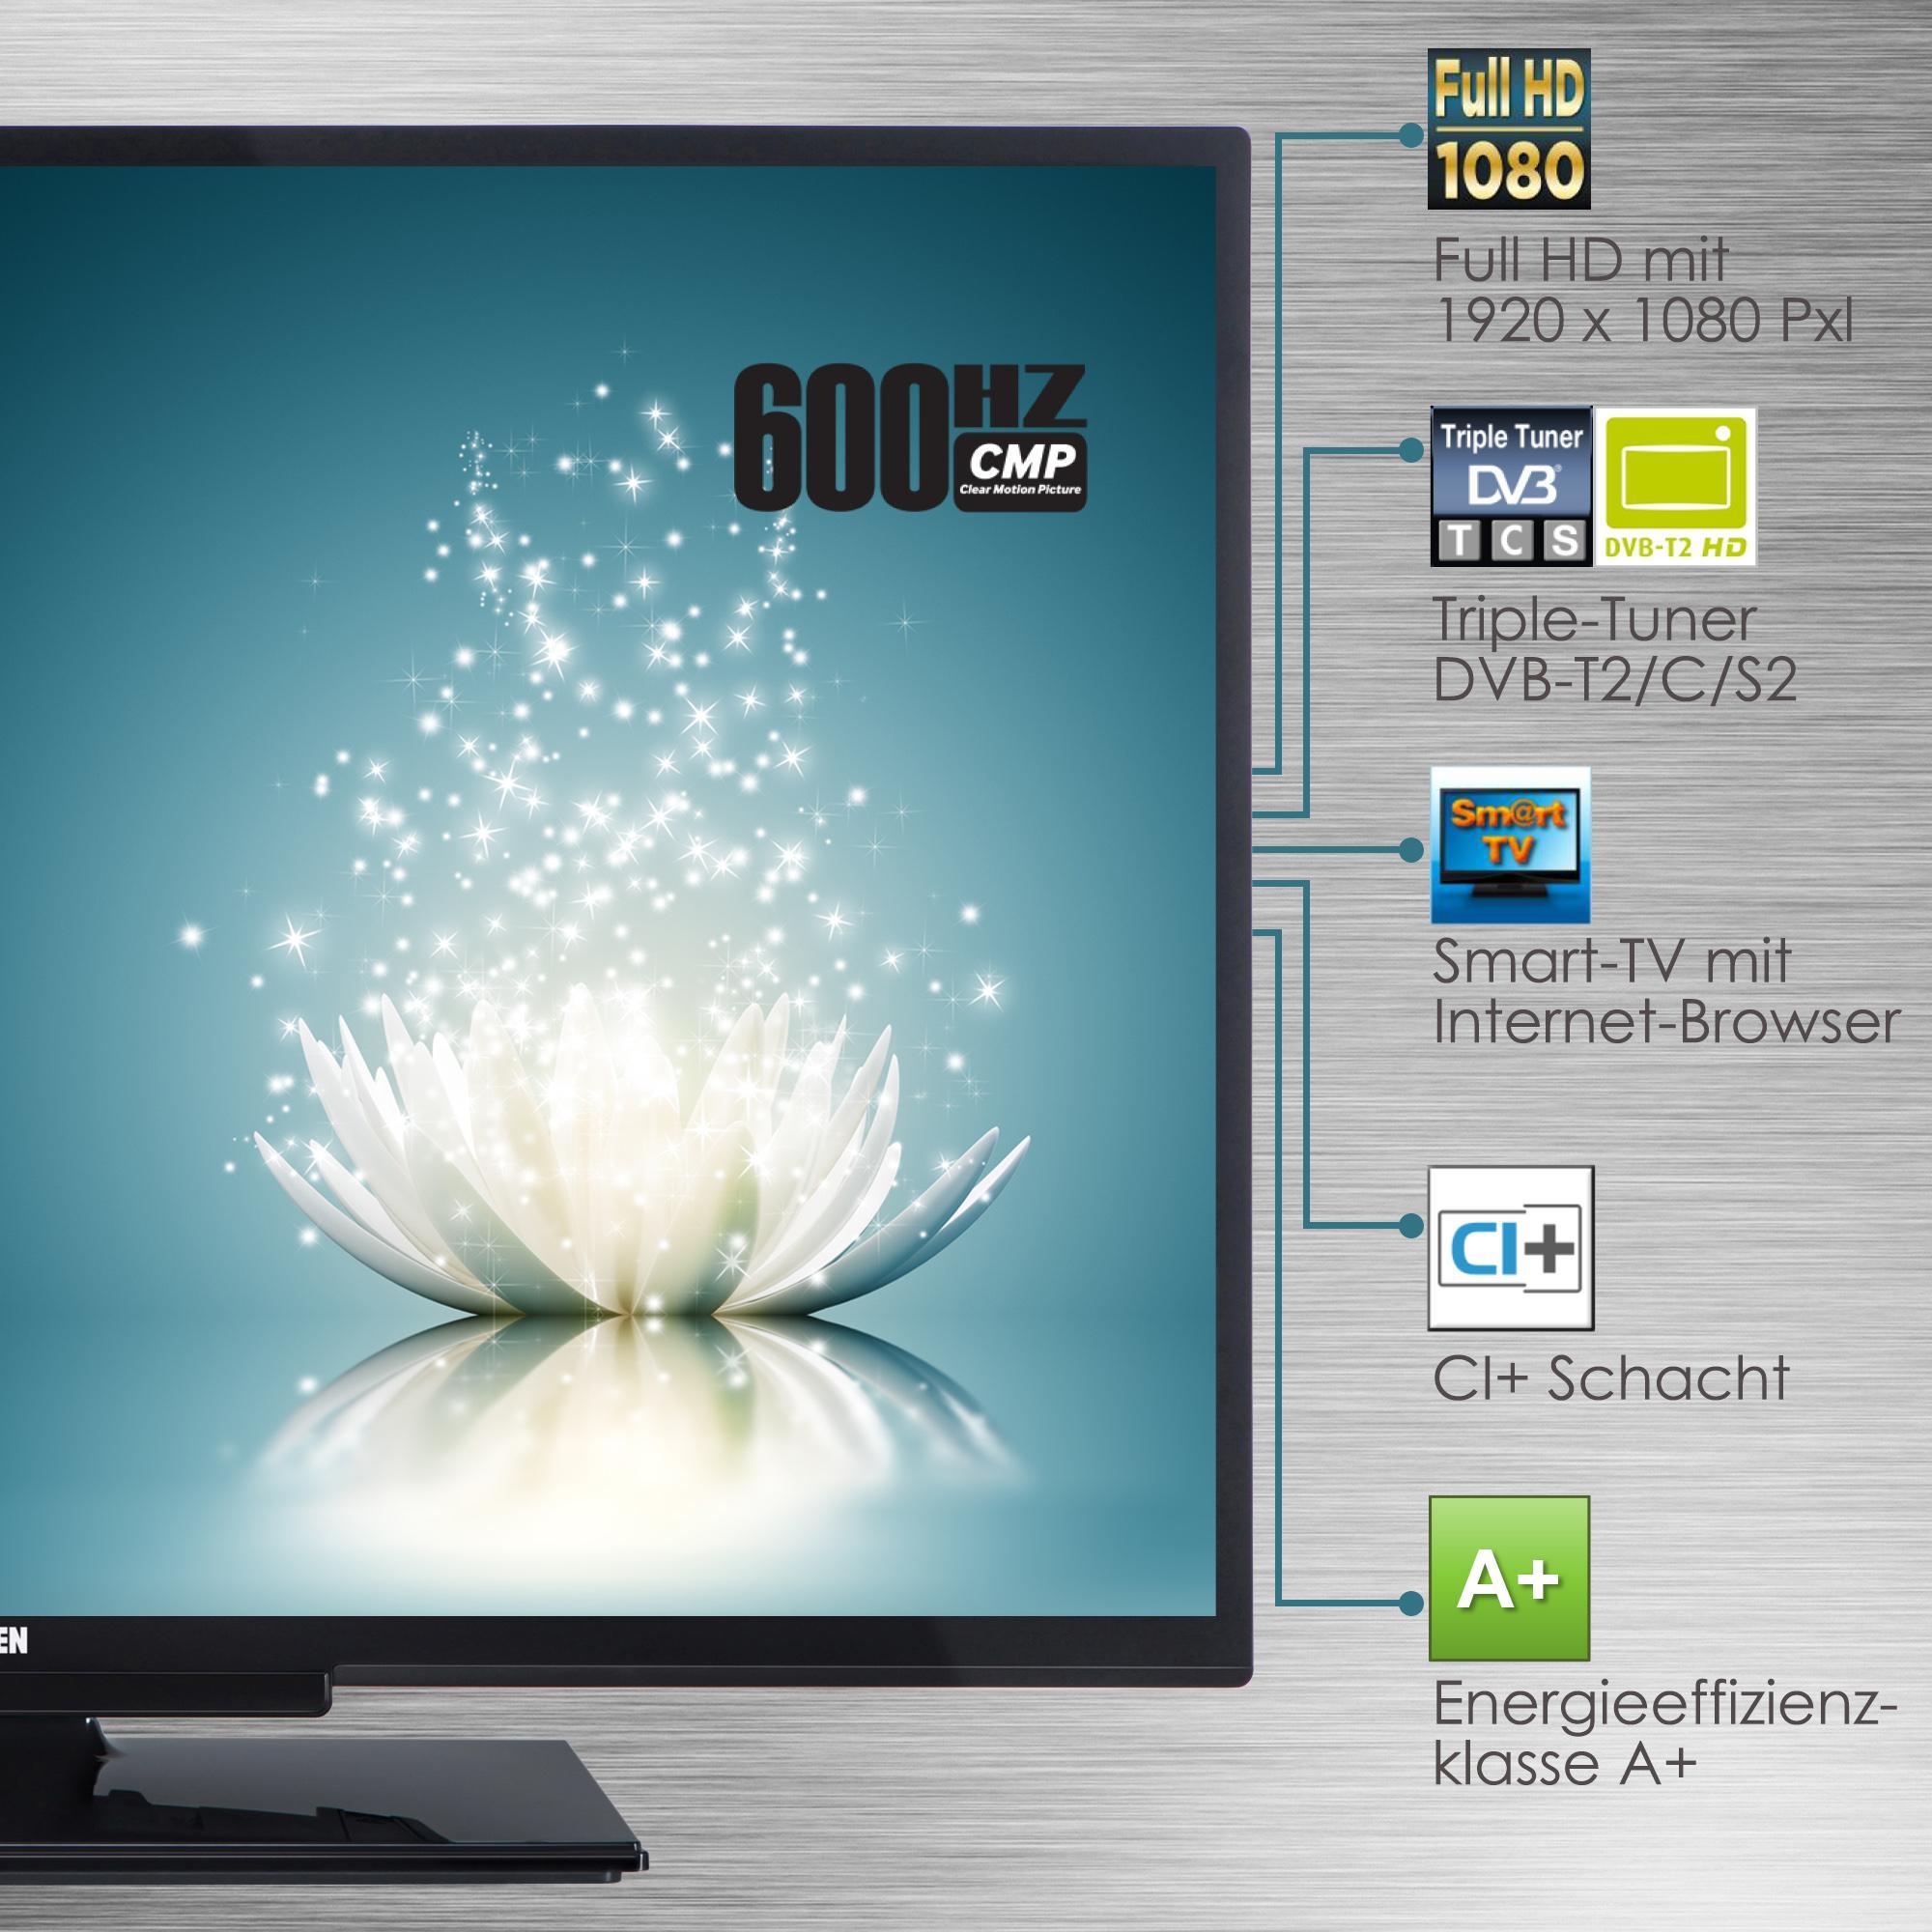 Telefunken XF32B301 81 cm (32 Zoll) Fernseher (Full HD